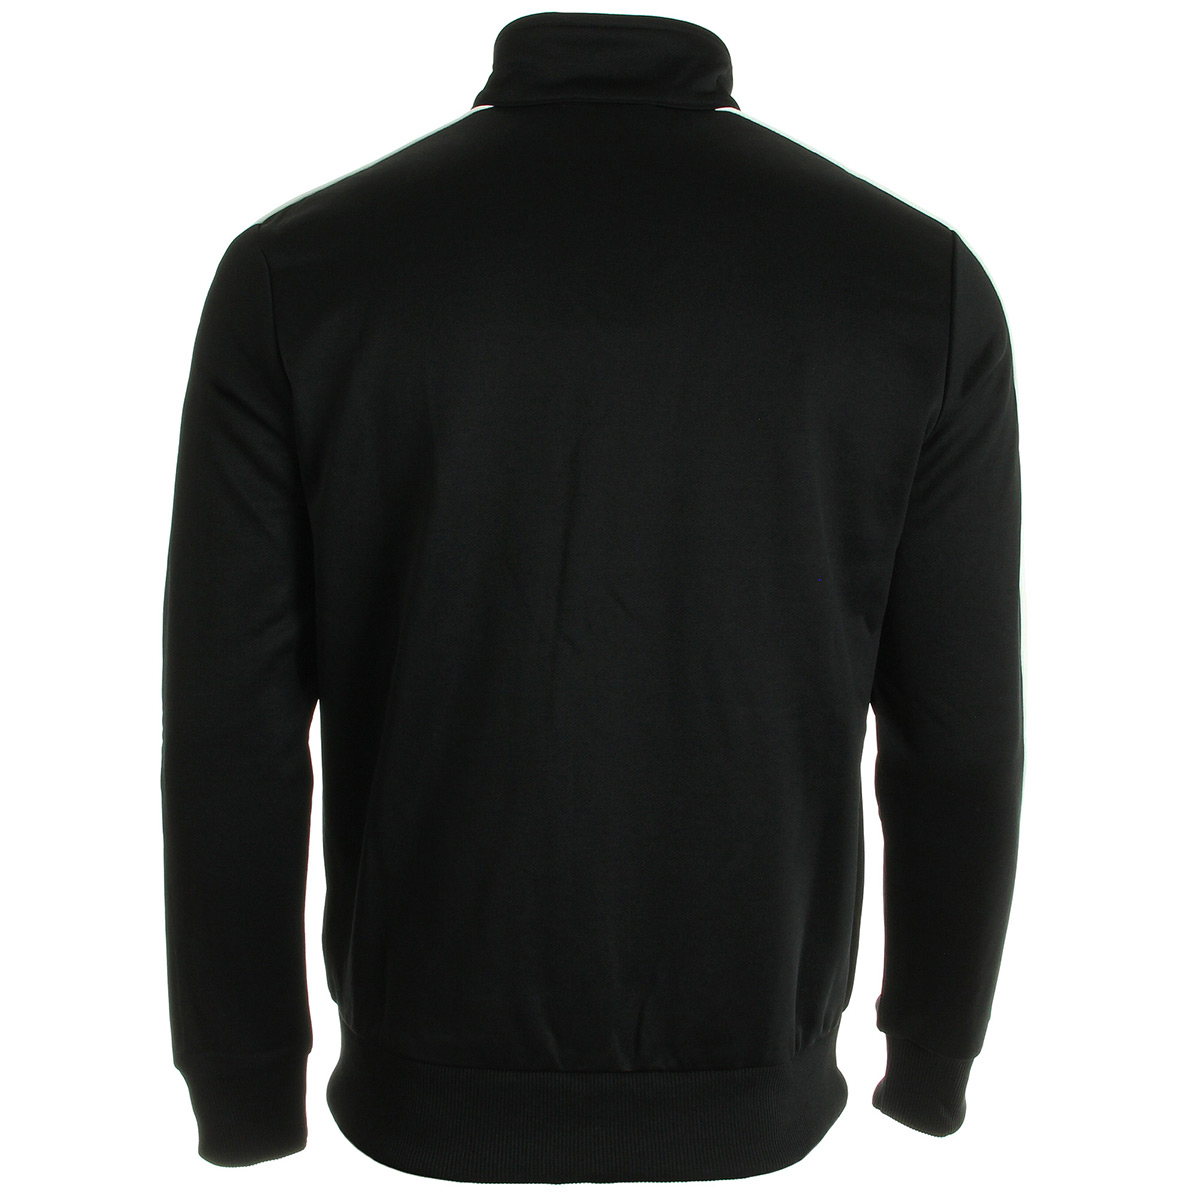 Puma Archive T7 Tracks Jacket 57265801, Vestes sport homme